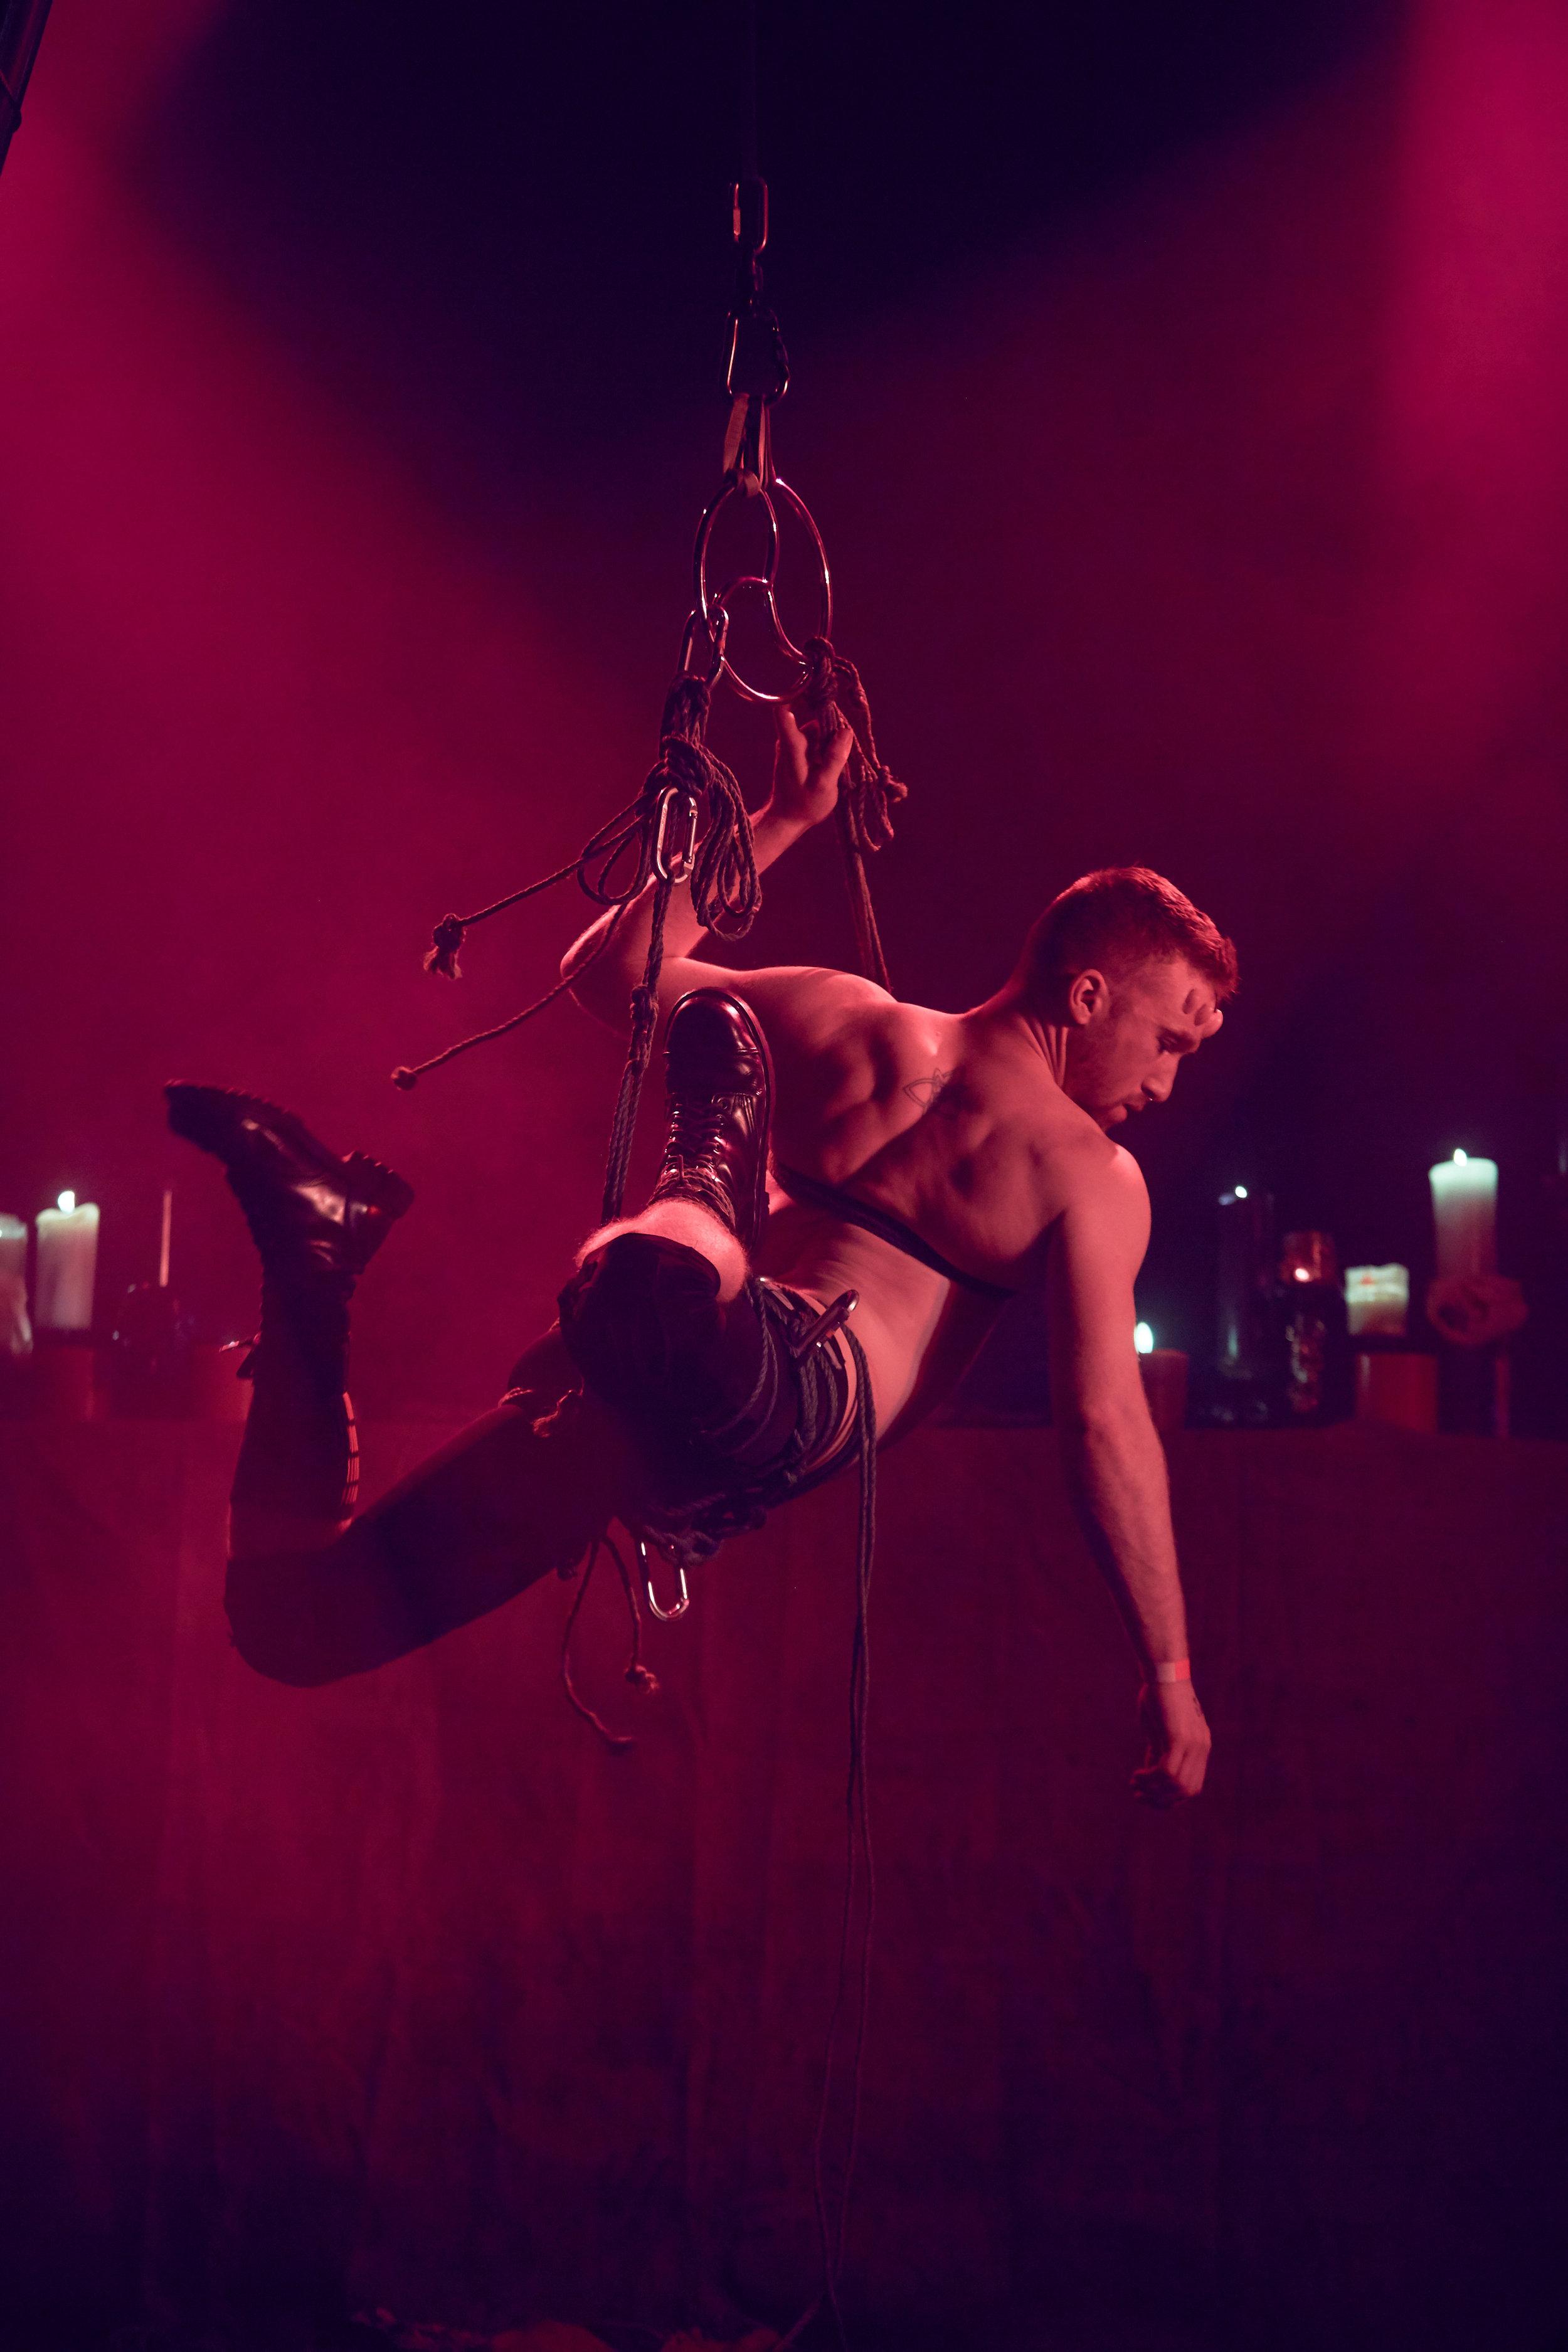 rope suspension/shibari